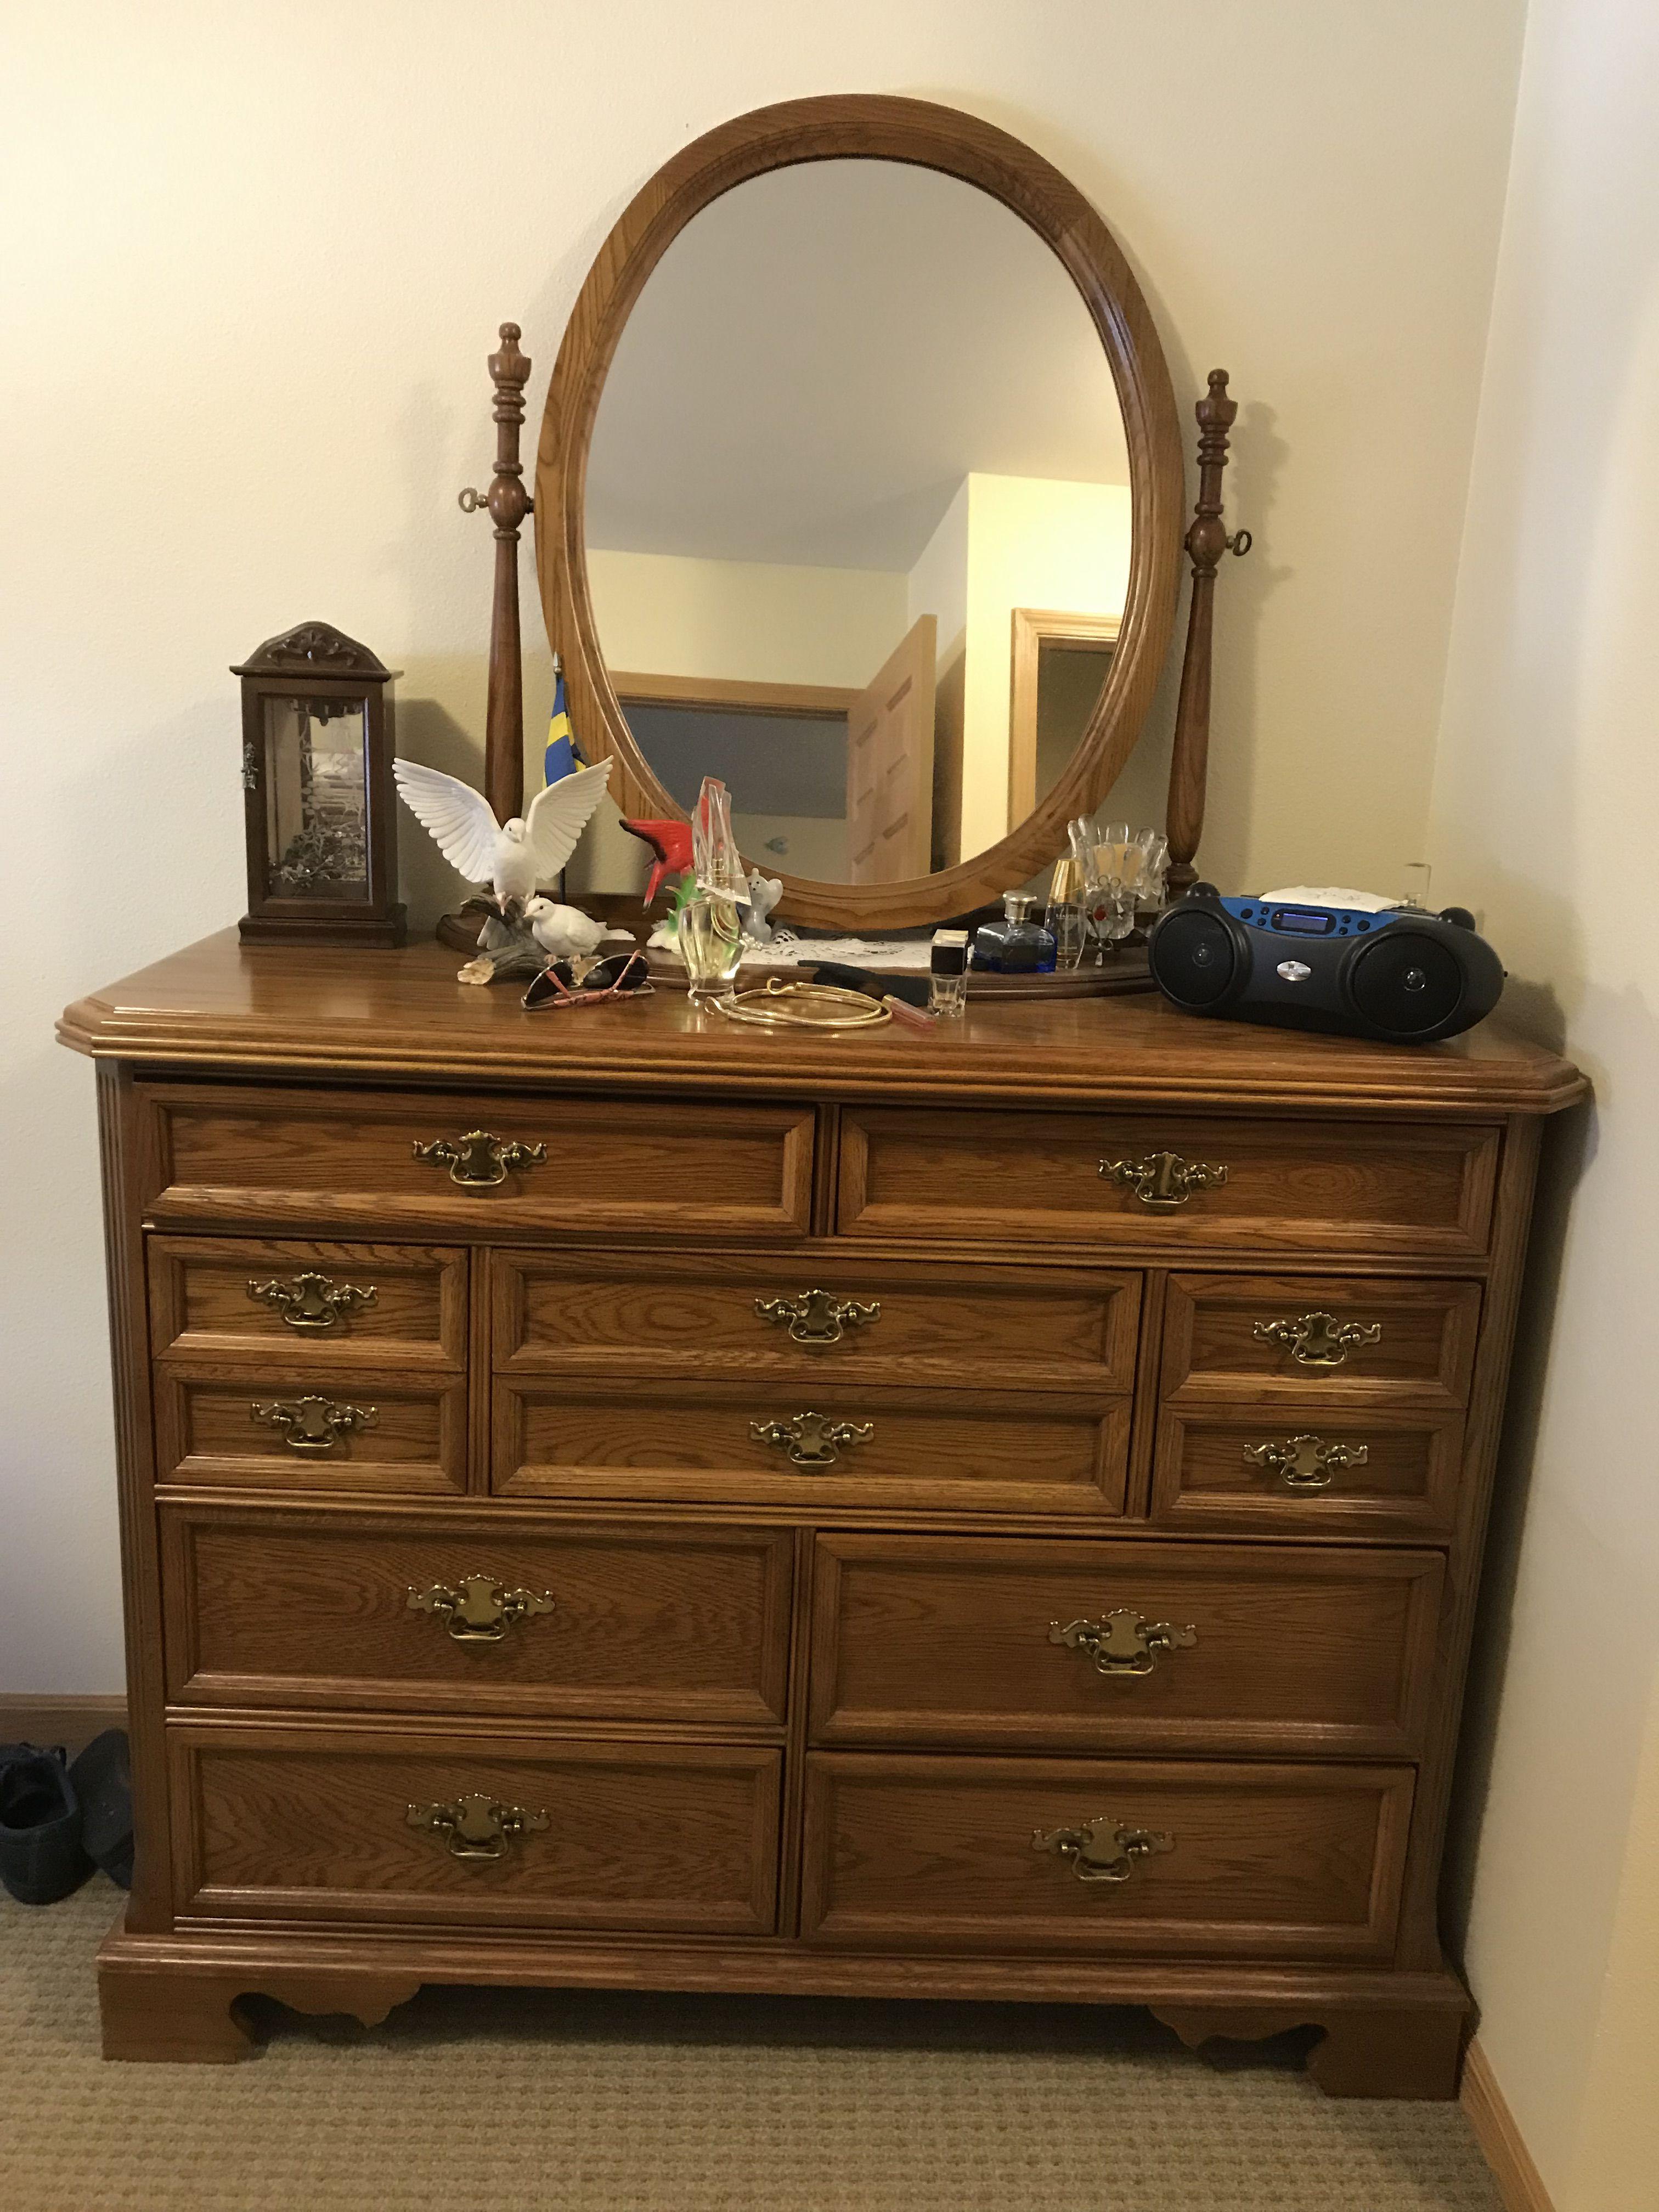 Beautiful Bedroom Set for Sale image 1